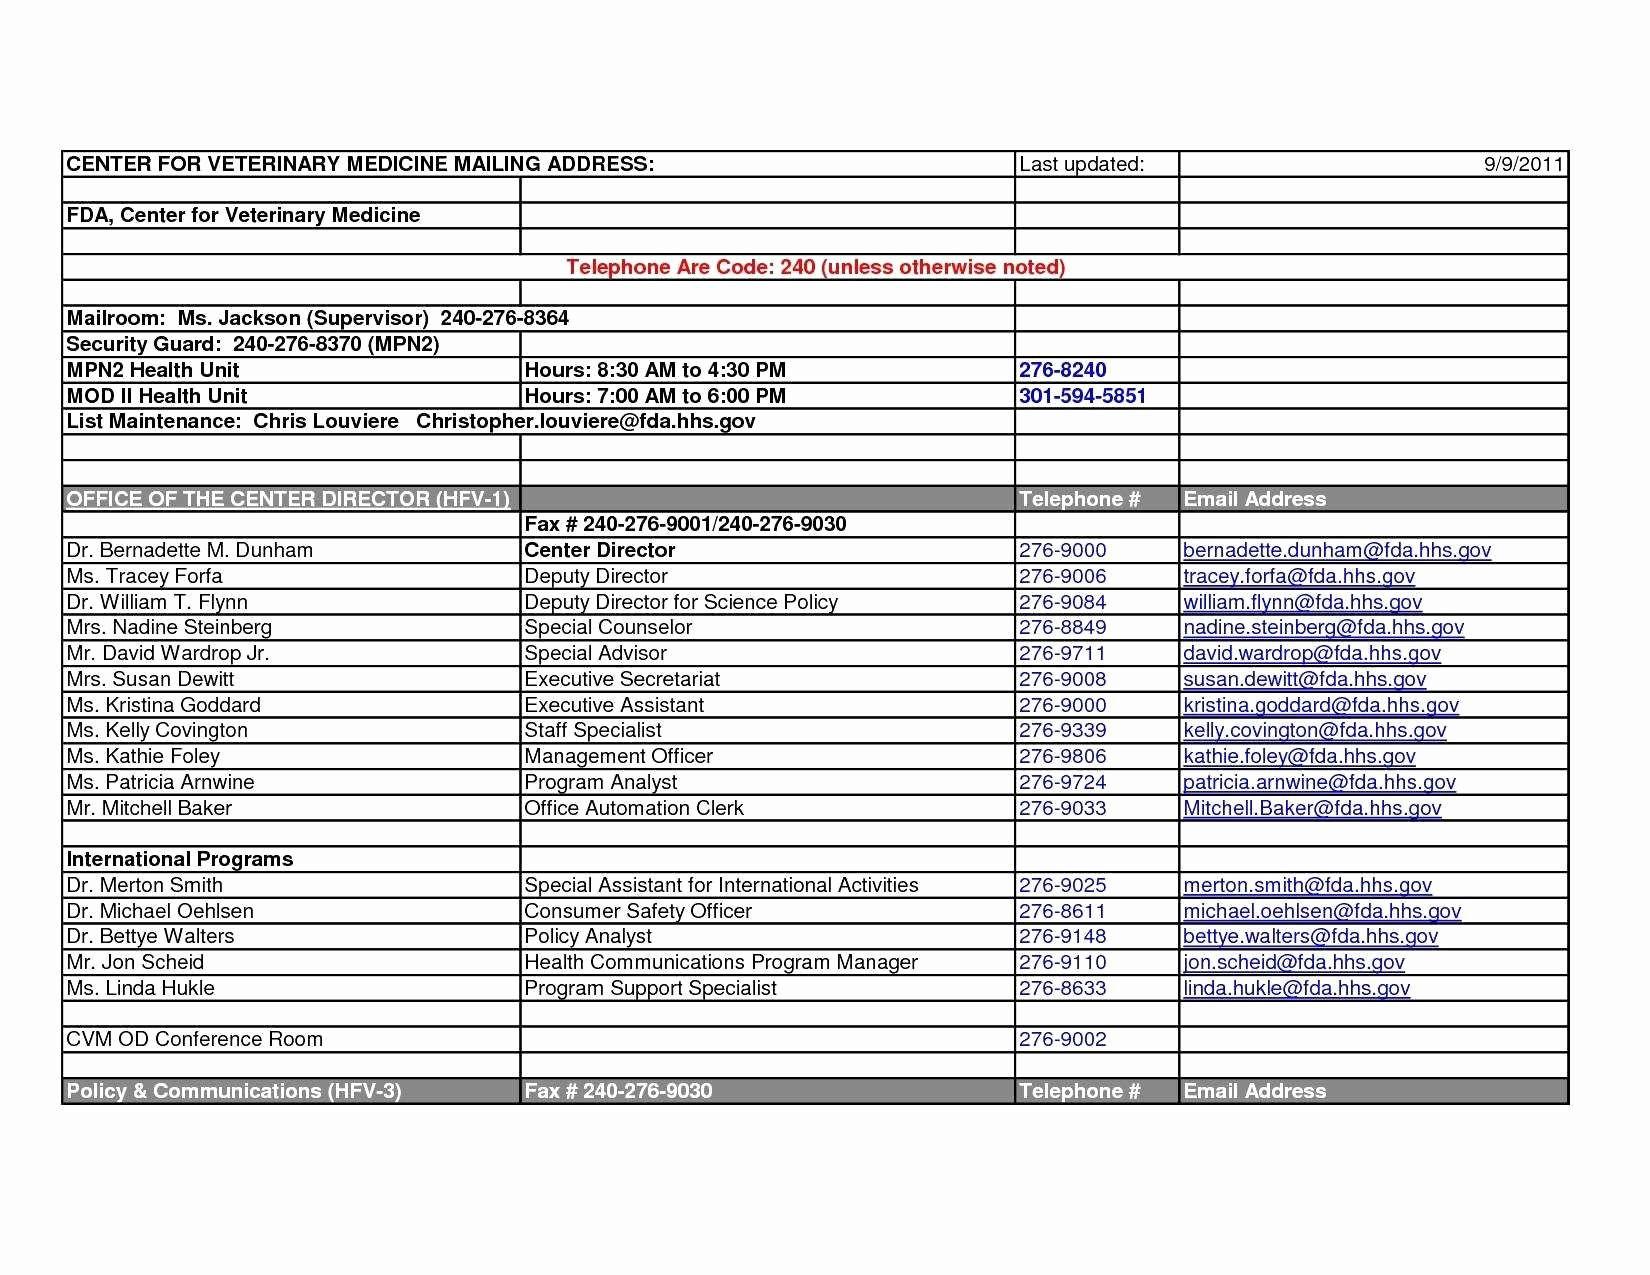 Used Car Dealer Spreadsheet Regarding Car Sales Commission Spreadsheet Inspirational Car Buying